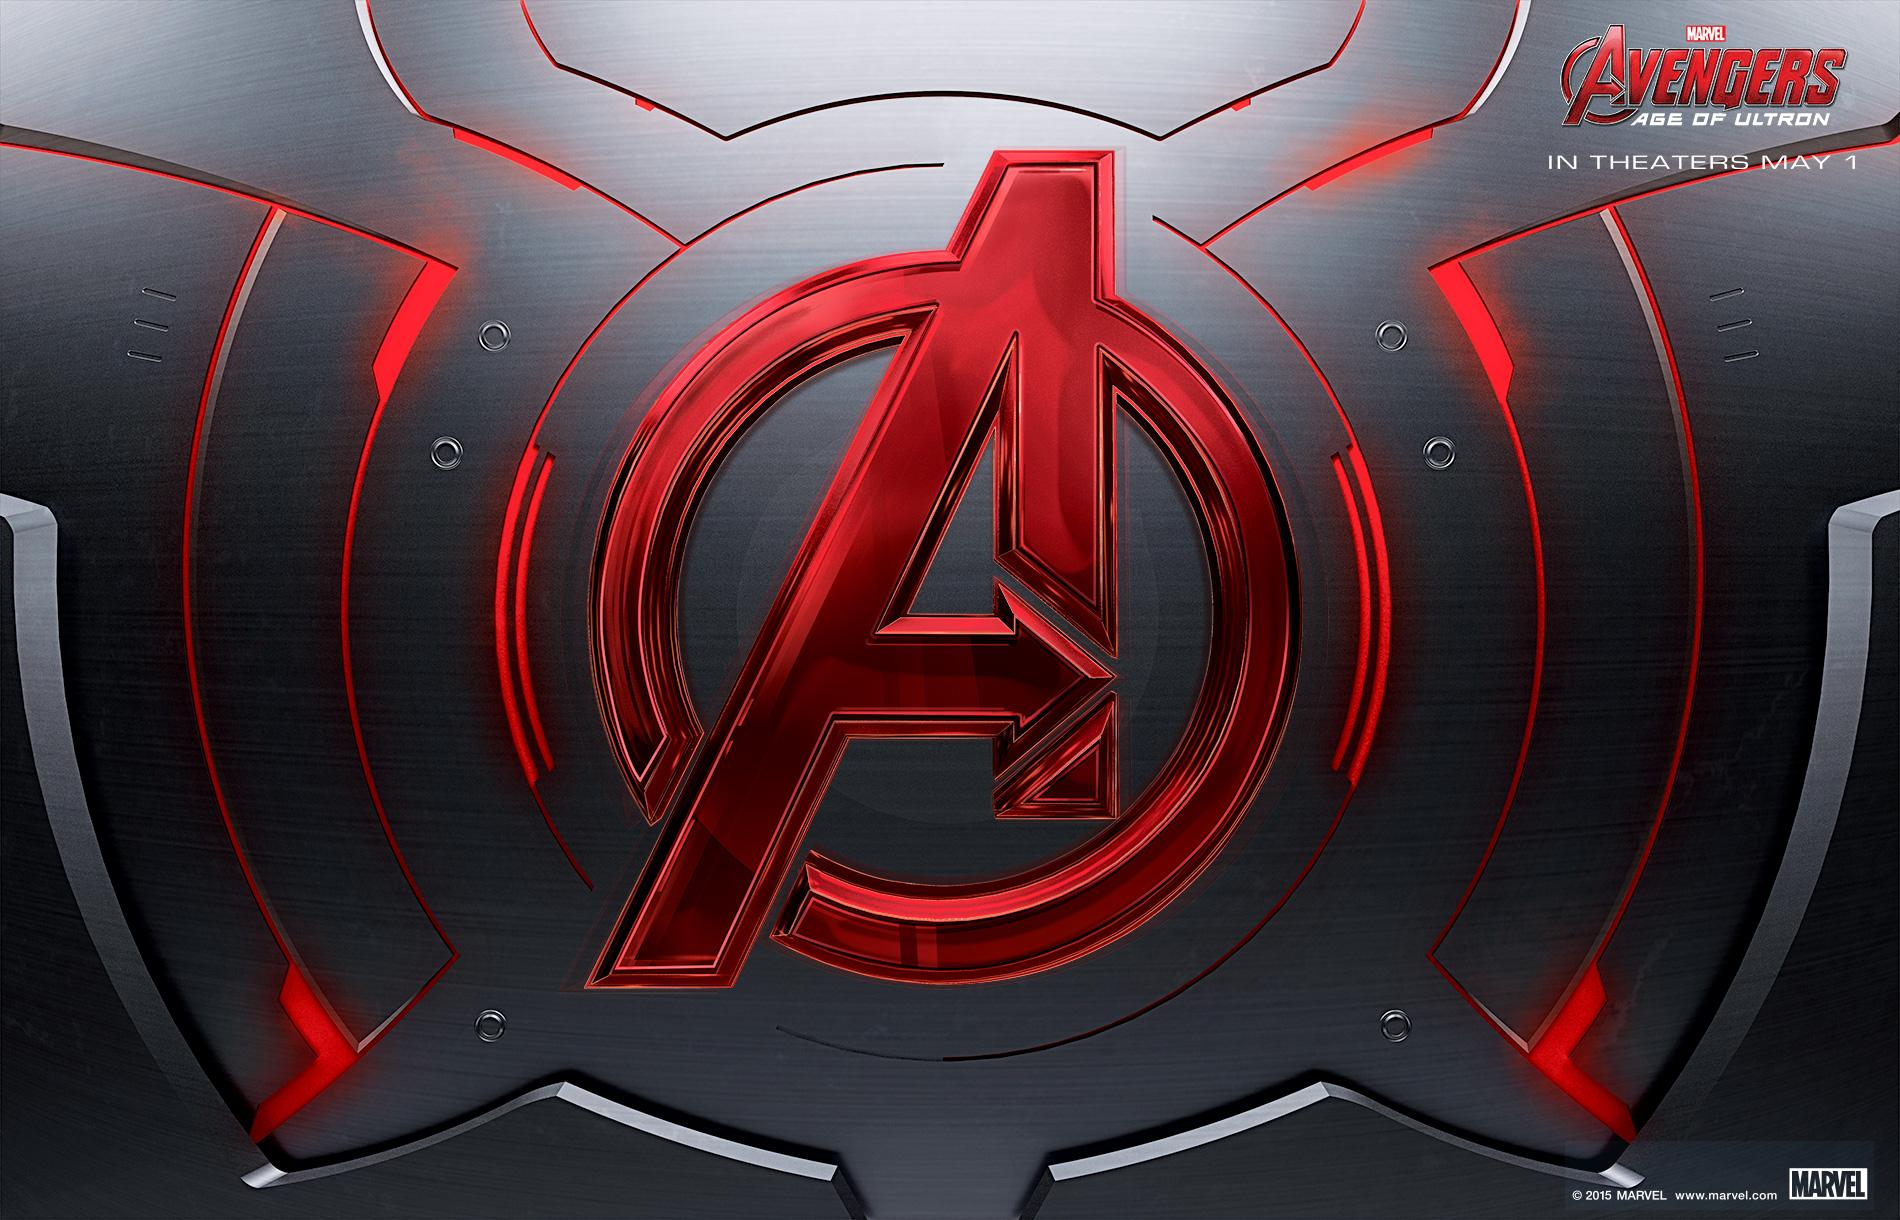 Avengers L 200 Re D Ultron Audi Sort Le Grand Jeu Spot